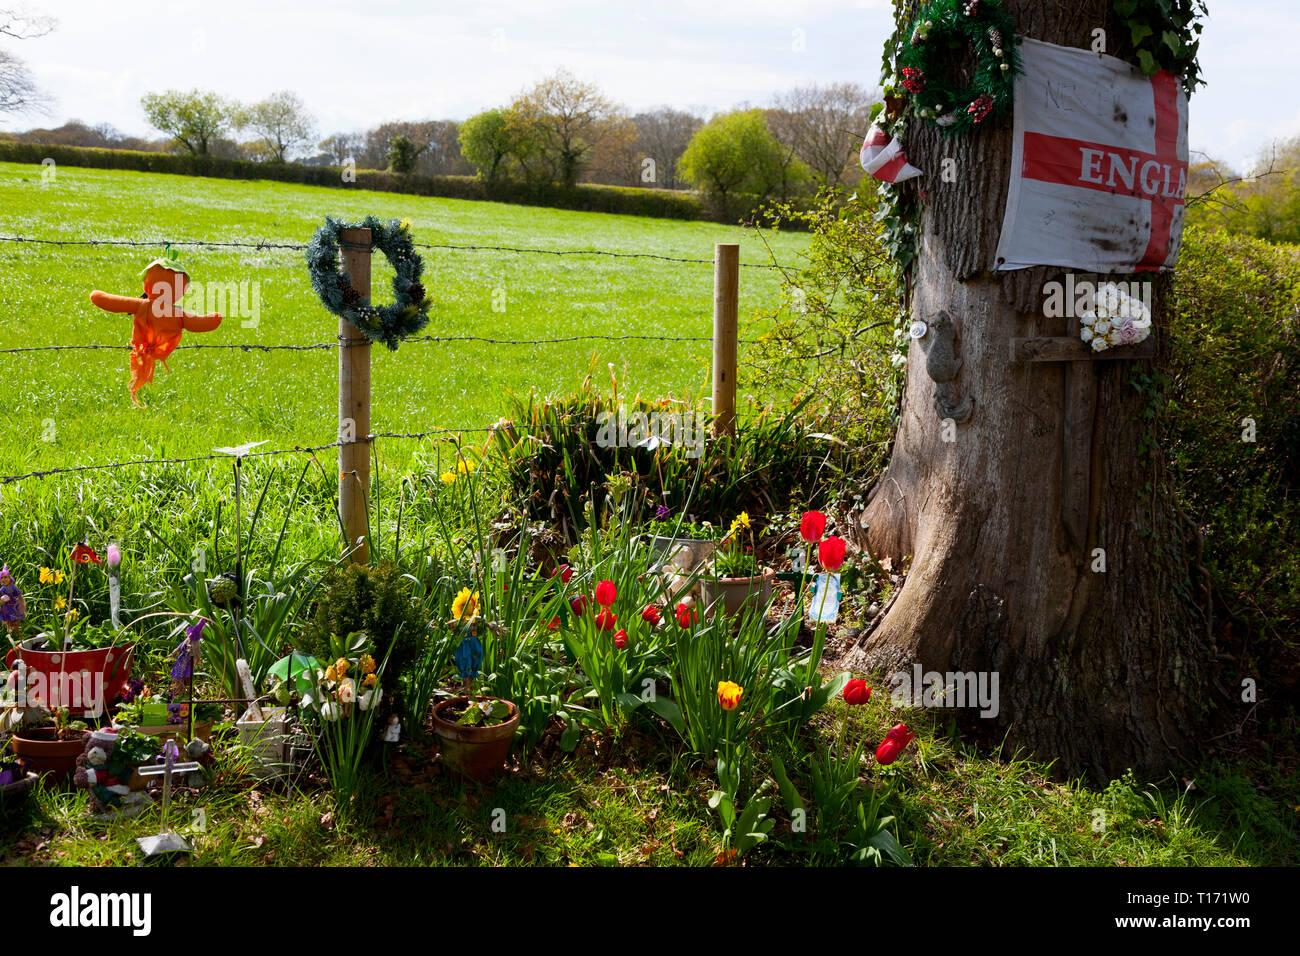 Santuario,memorial,a,carretera,accidentes,víctima,víctimas,Inglaterra, Imagen De Stock